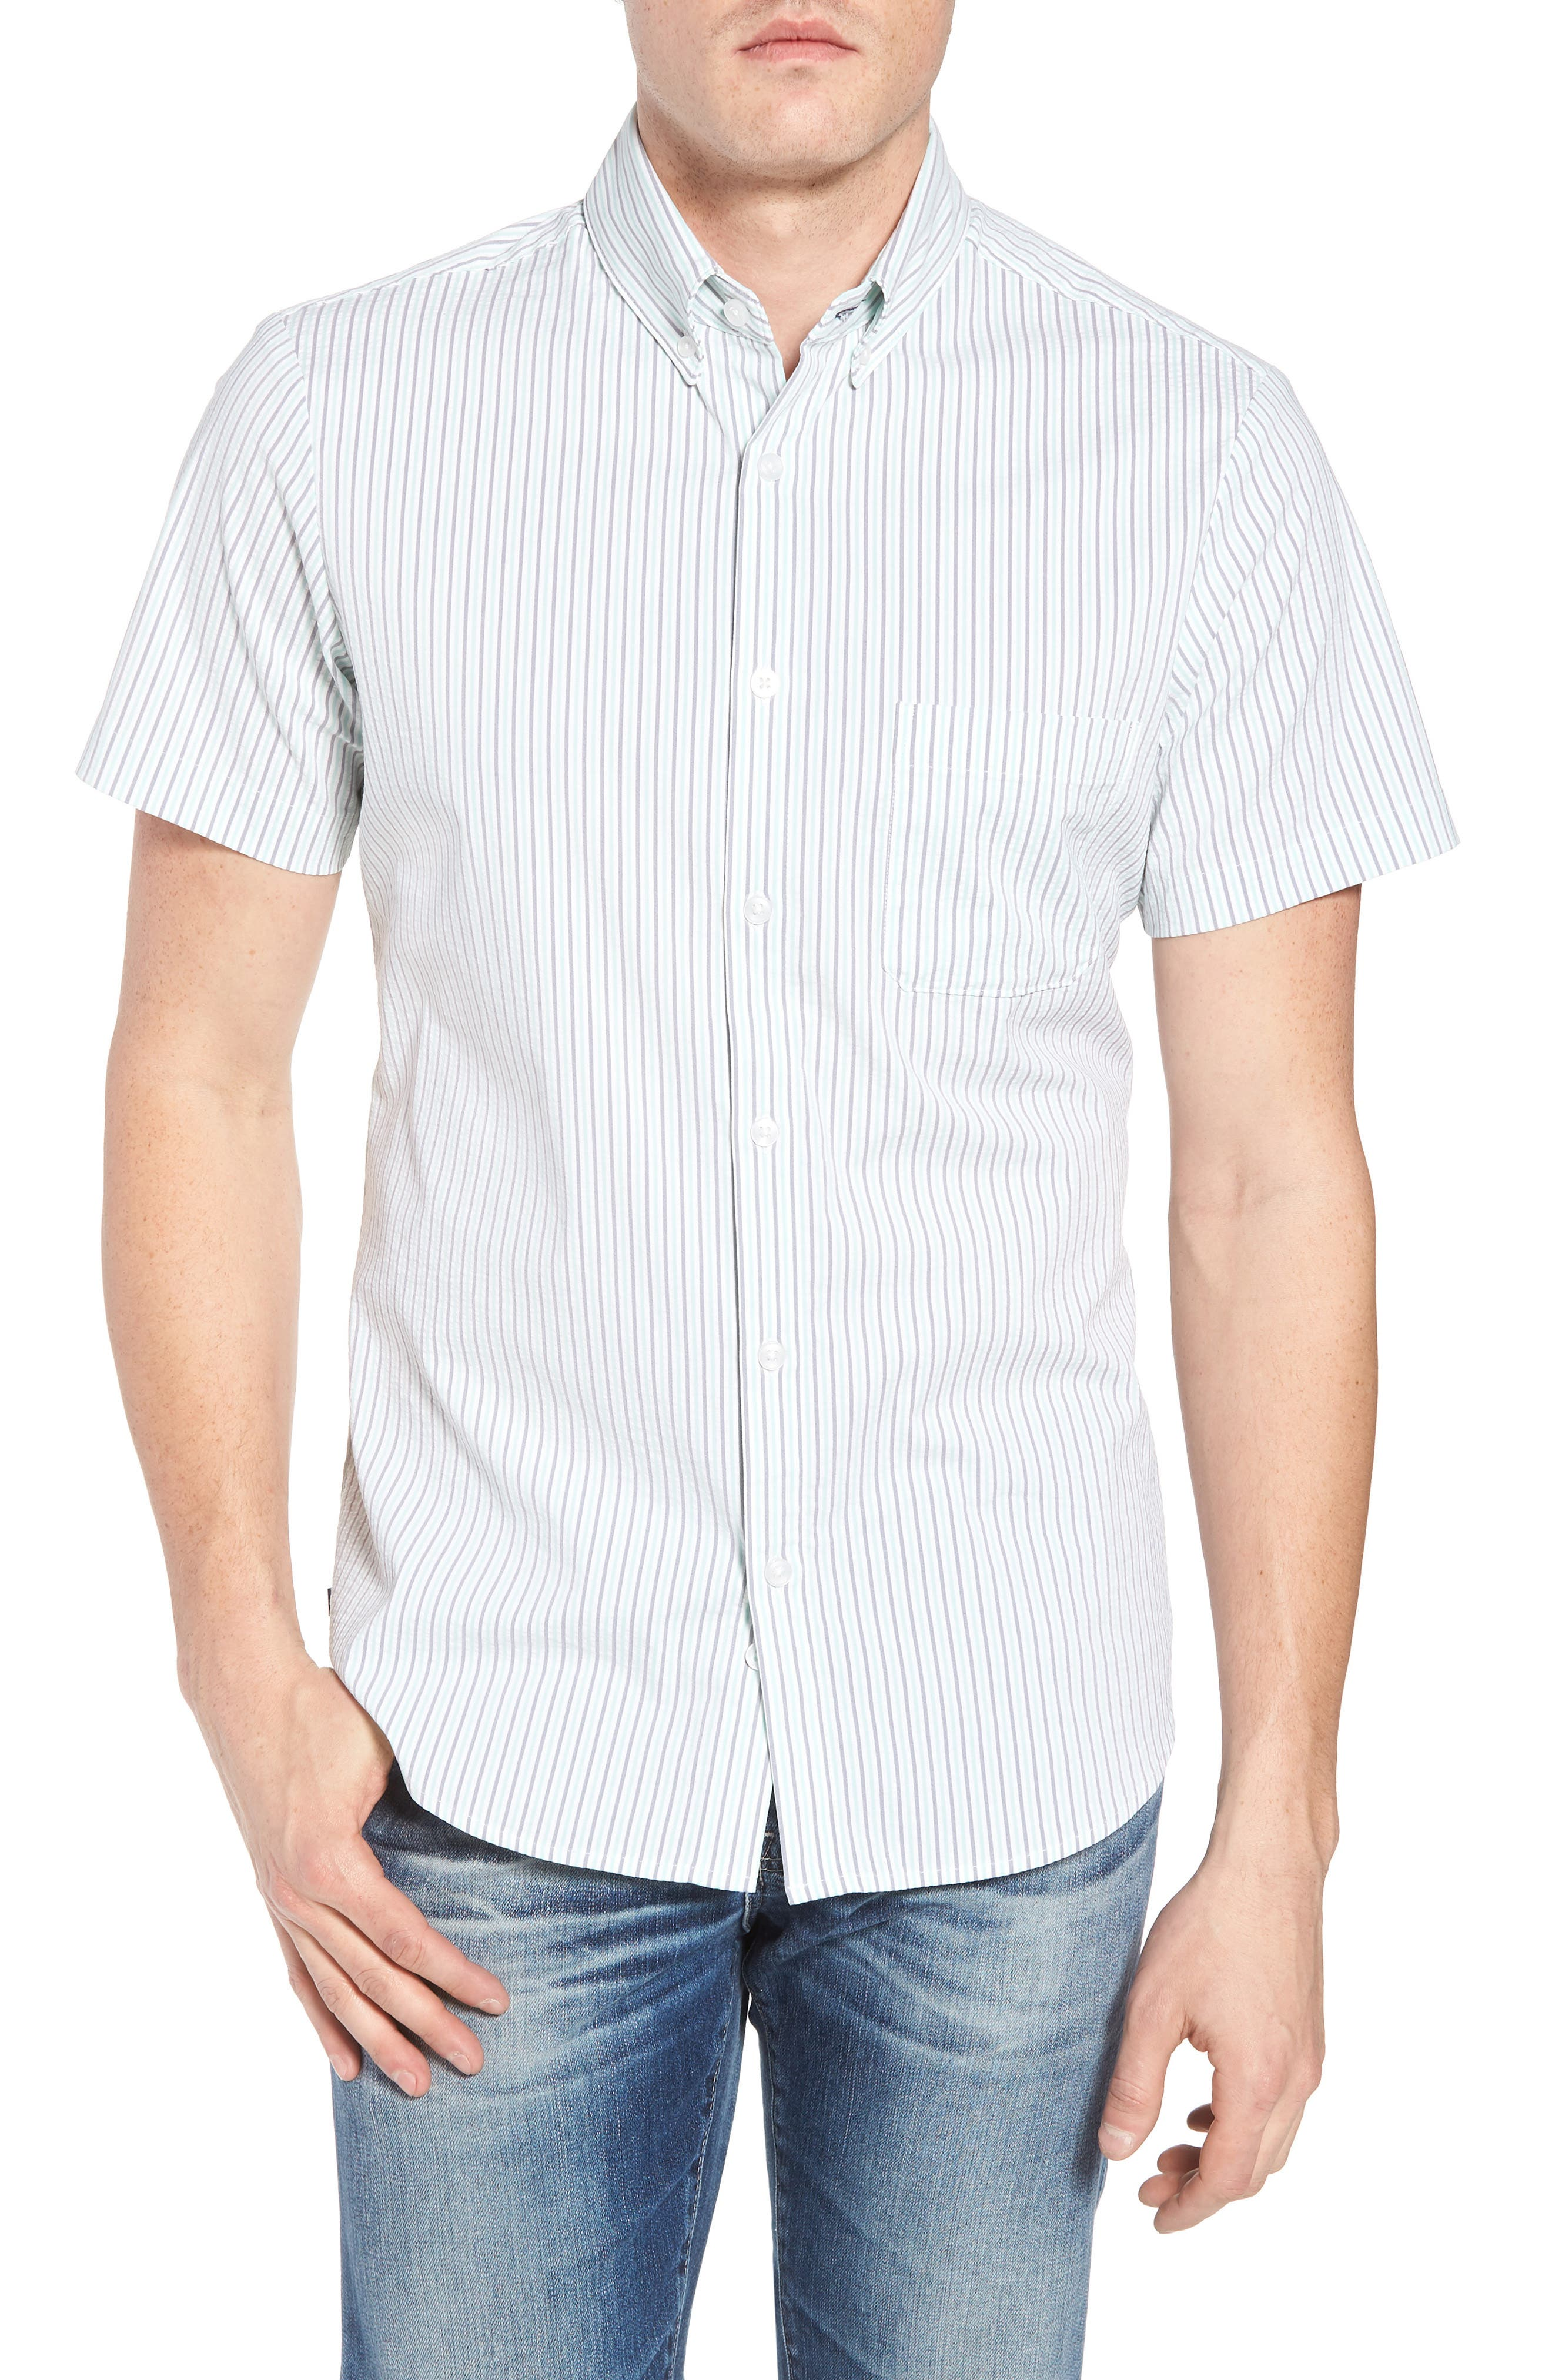 Eastland Short Sleeve Sport Shirt,                             Main thumbnail 1, color,                             Green